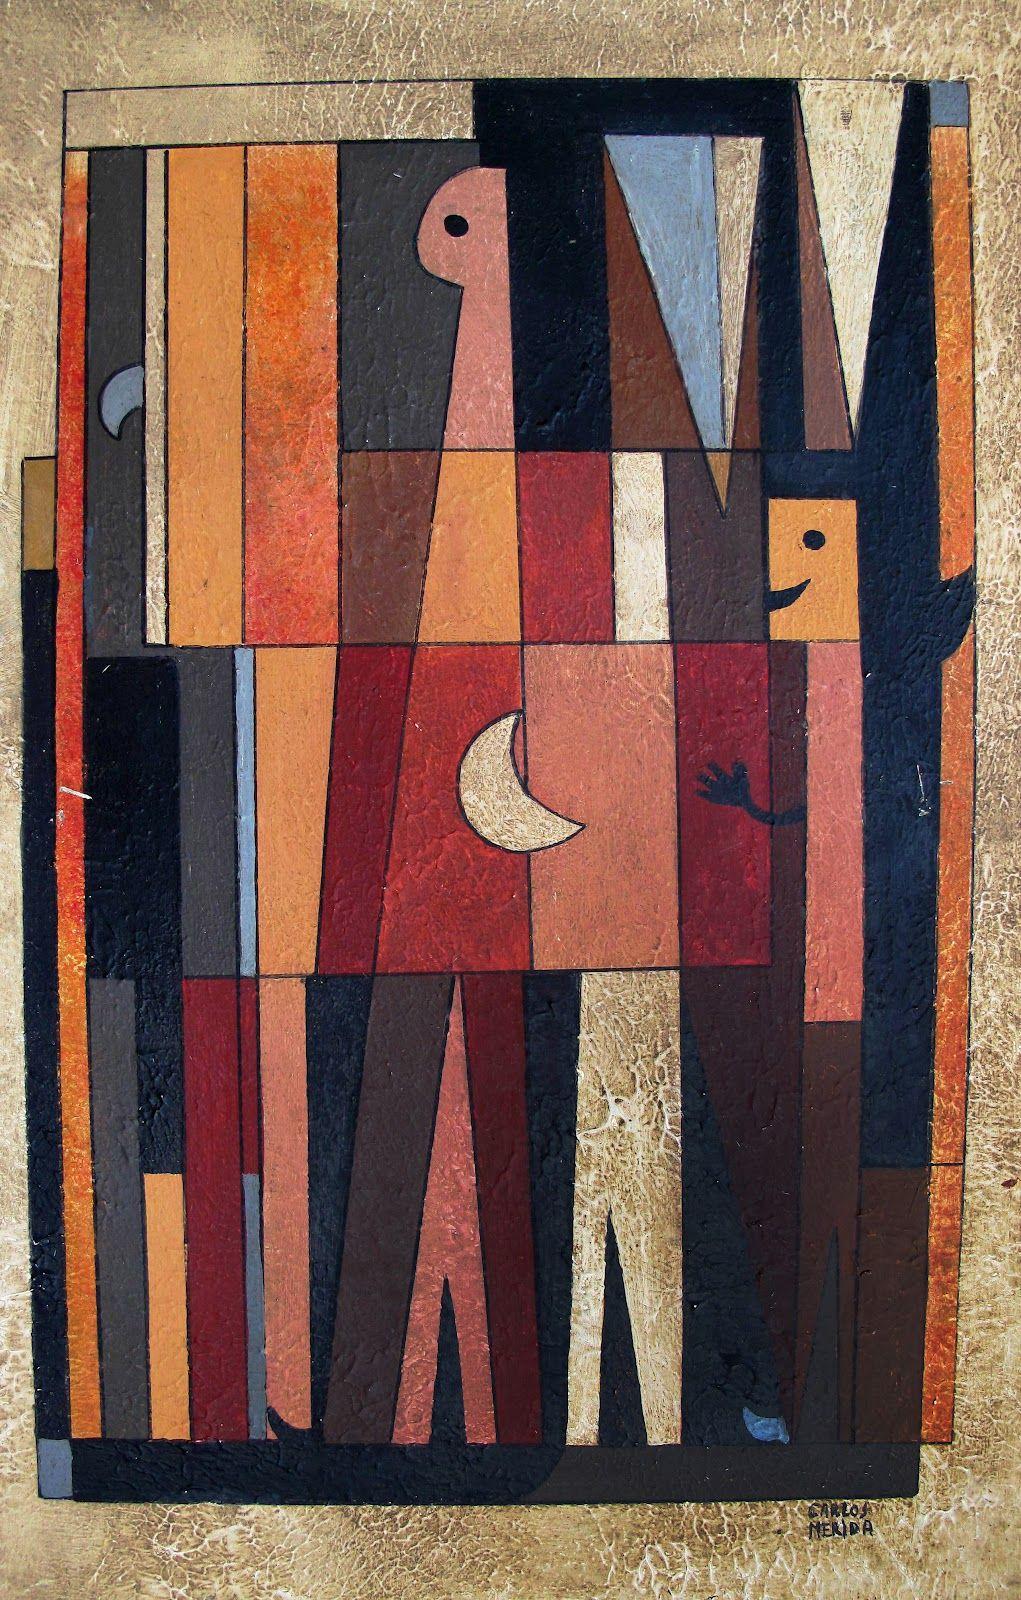 Carlos Merida Jpg Izobrazhenie Jpeg 1021 1600 Pikselov Masshtabirovannoe 55 Geometric Art 2d Abstract Artist